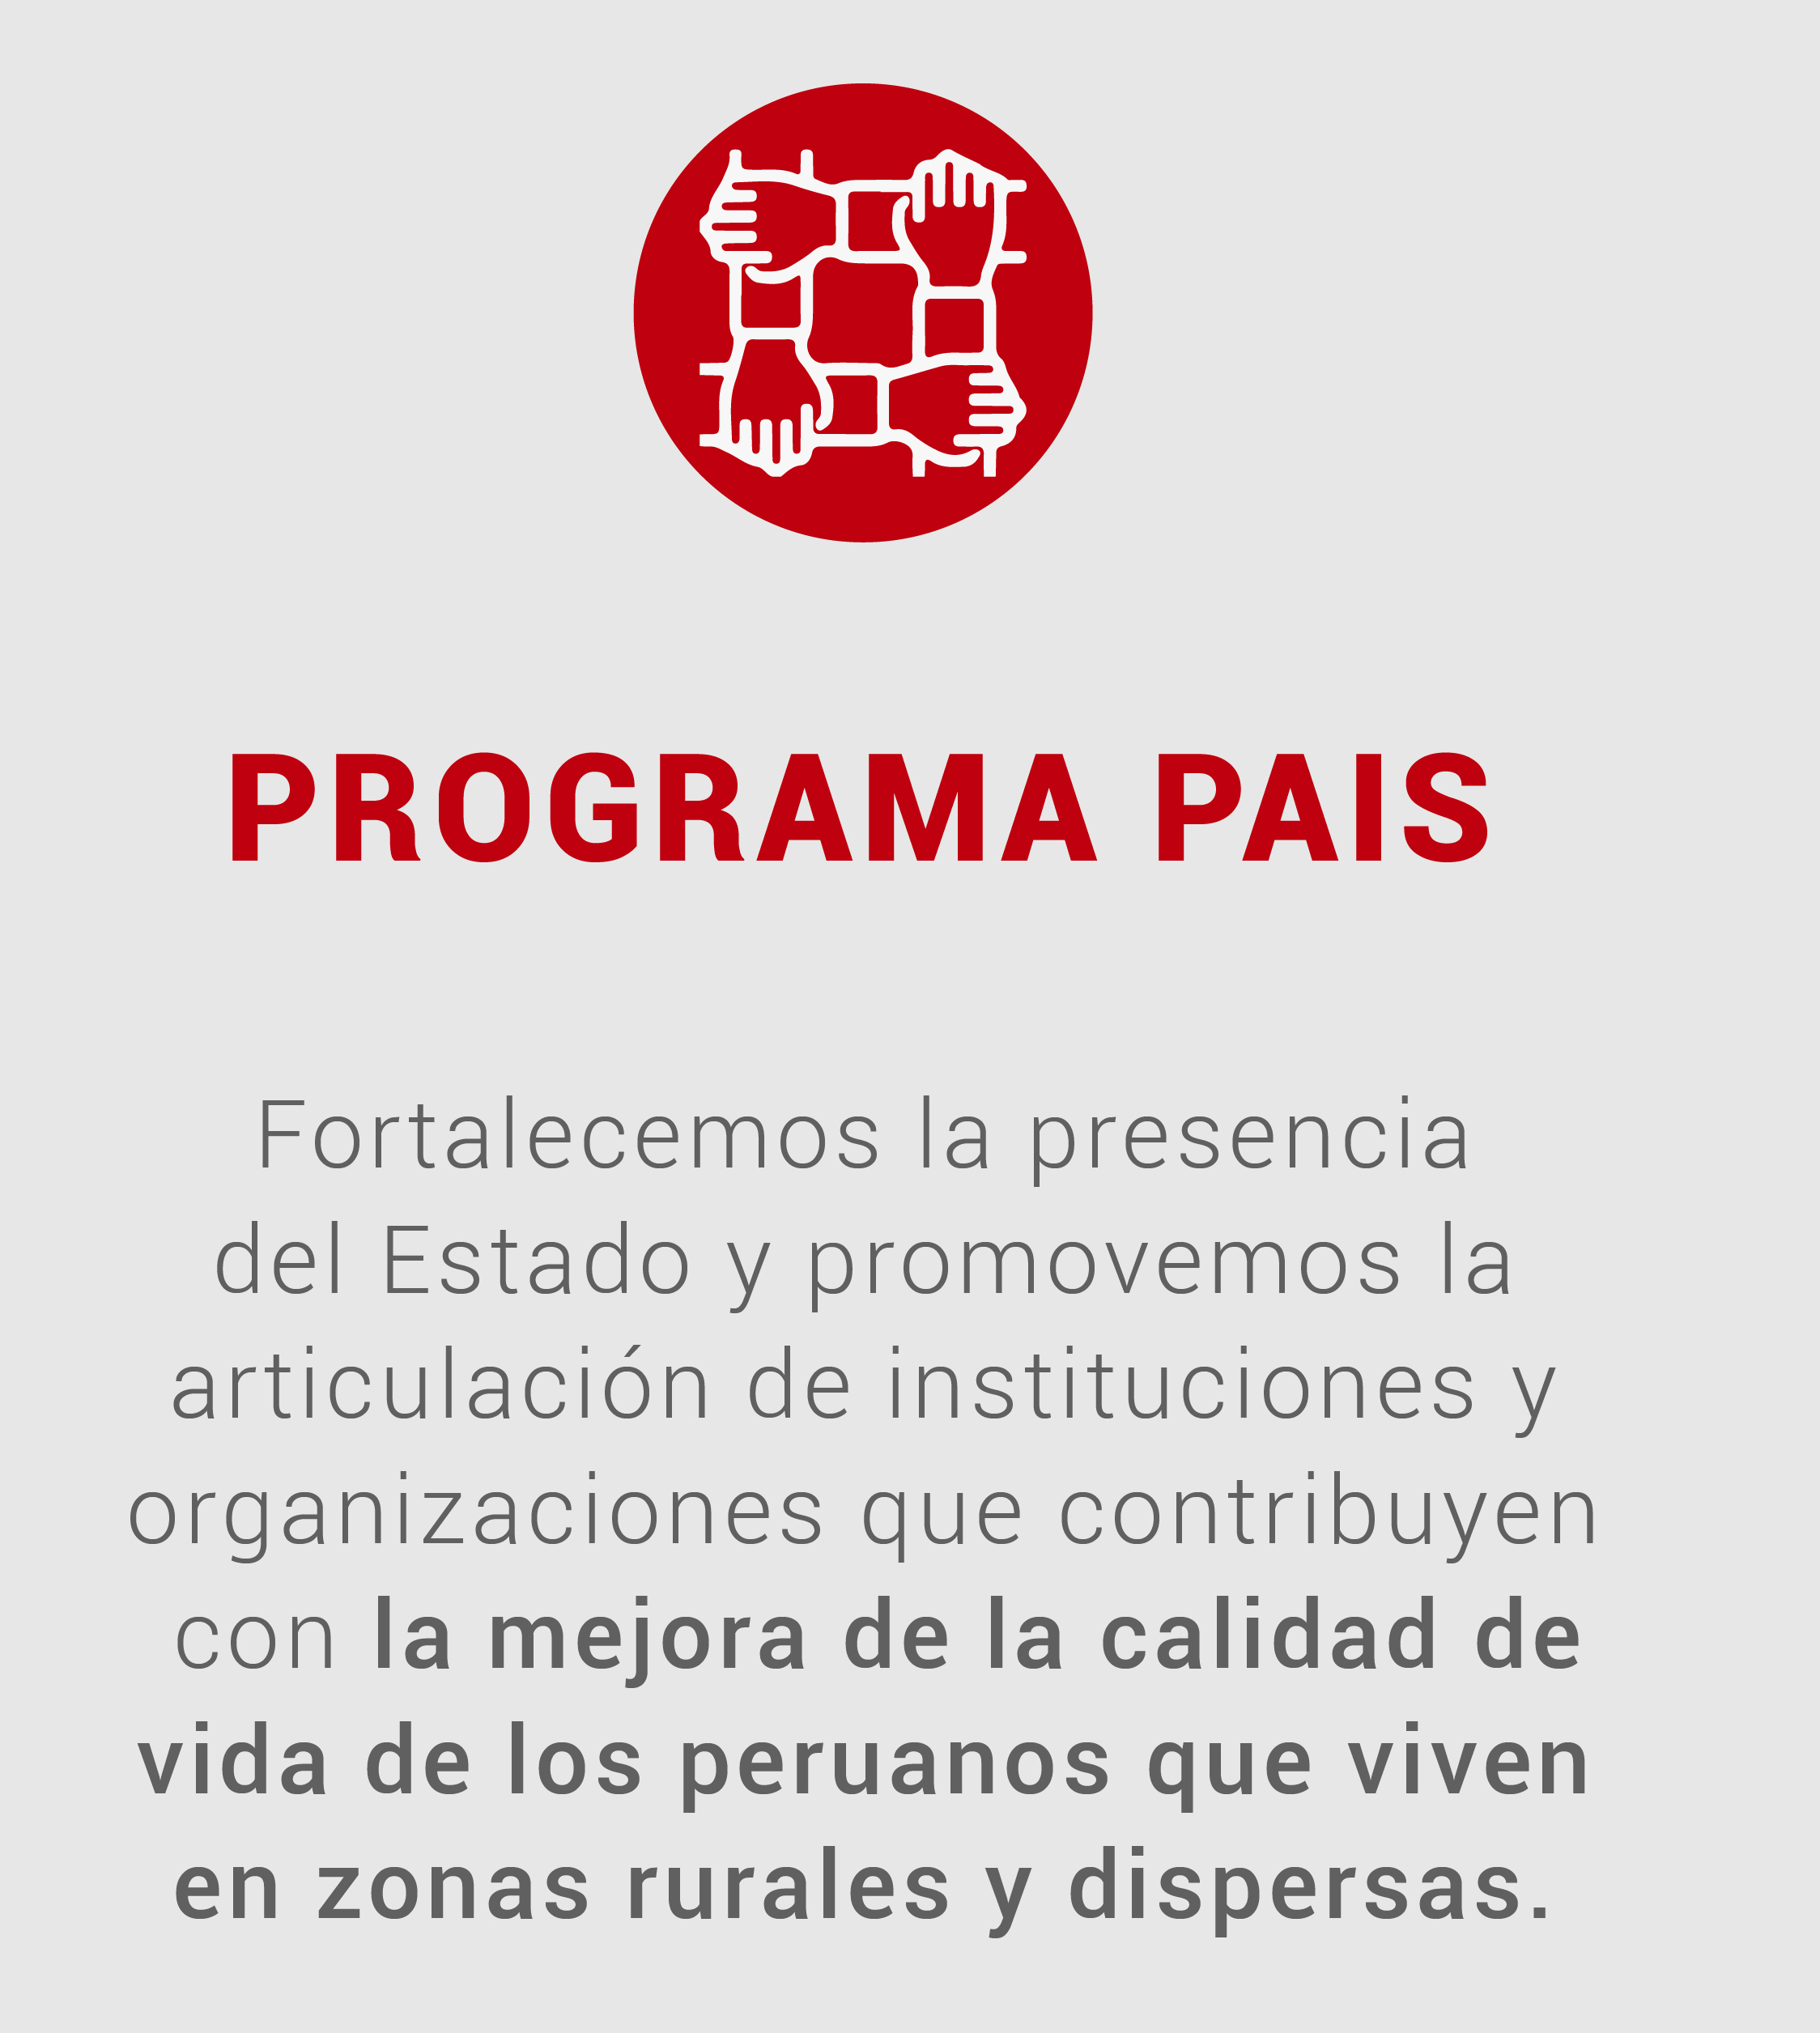 banco herramientas - Programa PAIS